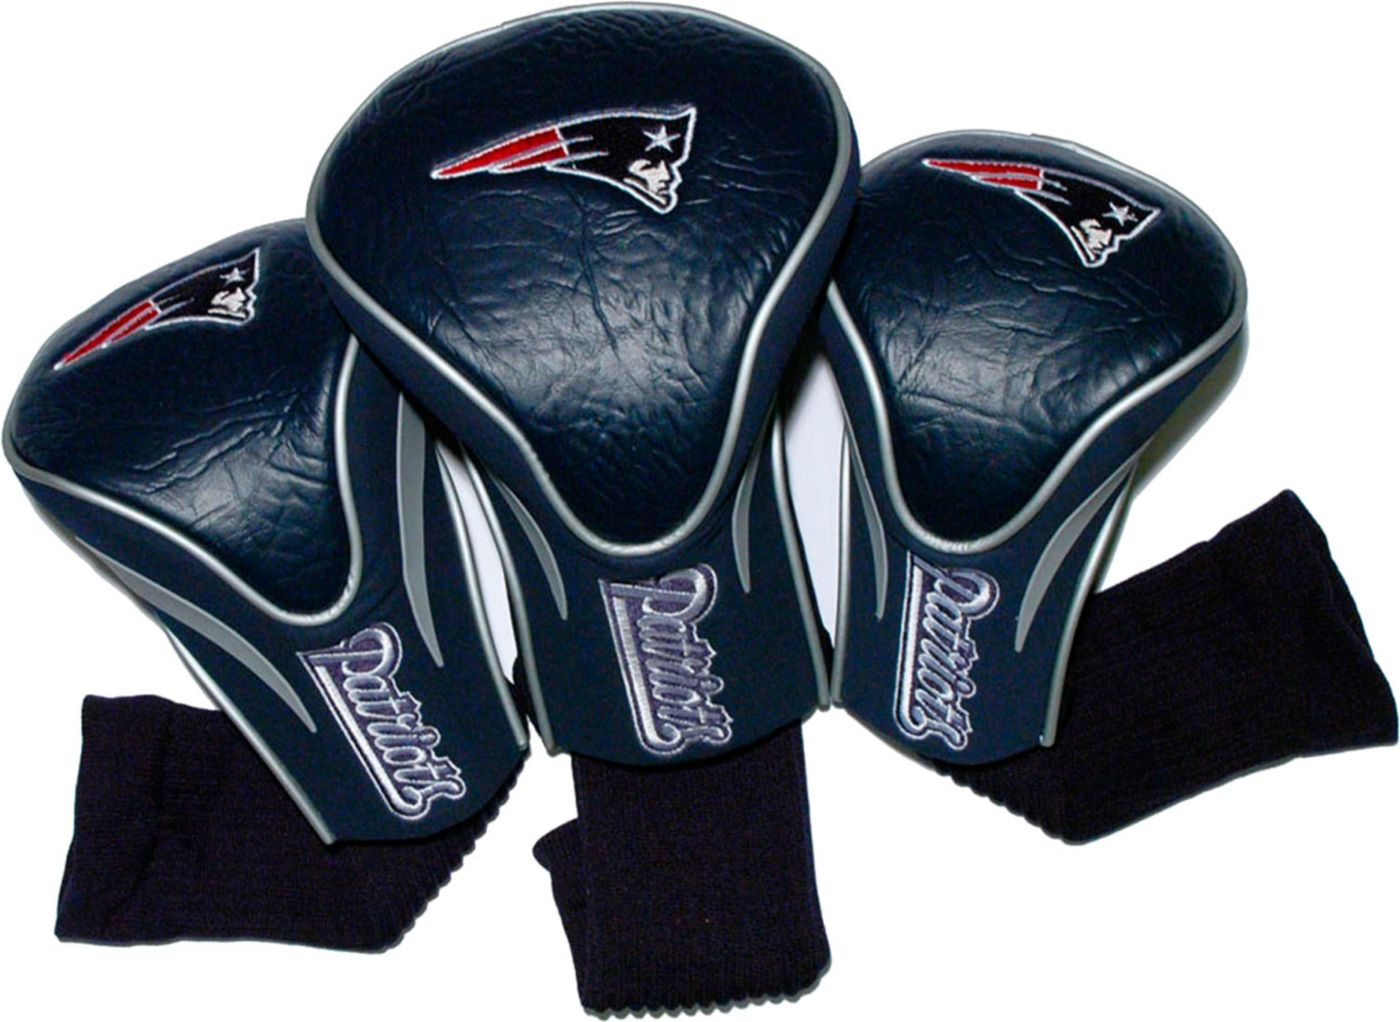 Team Golf New England Patriots 3-Pack Contour Headcovers